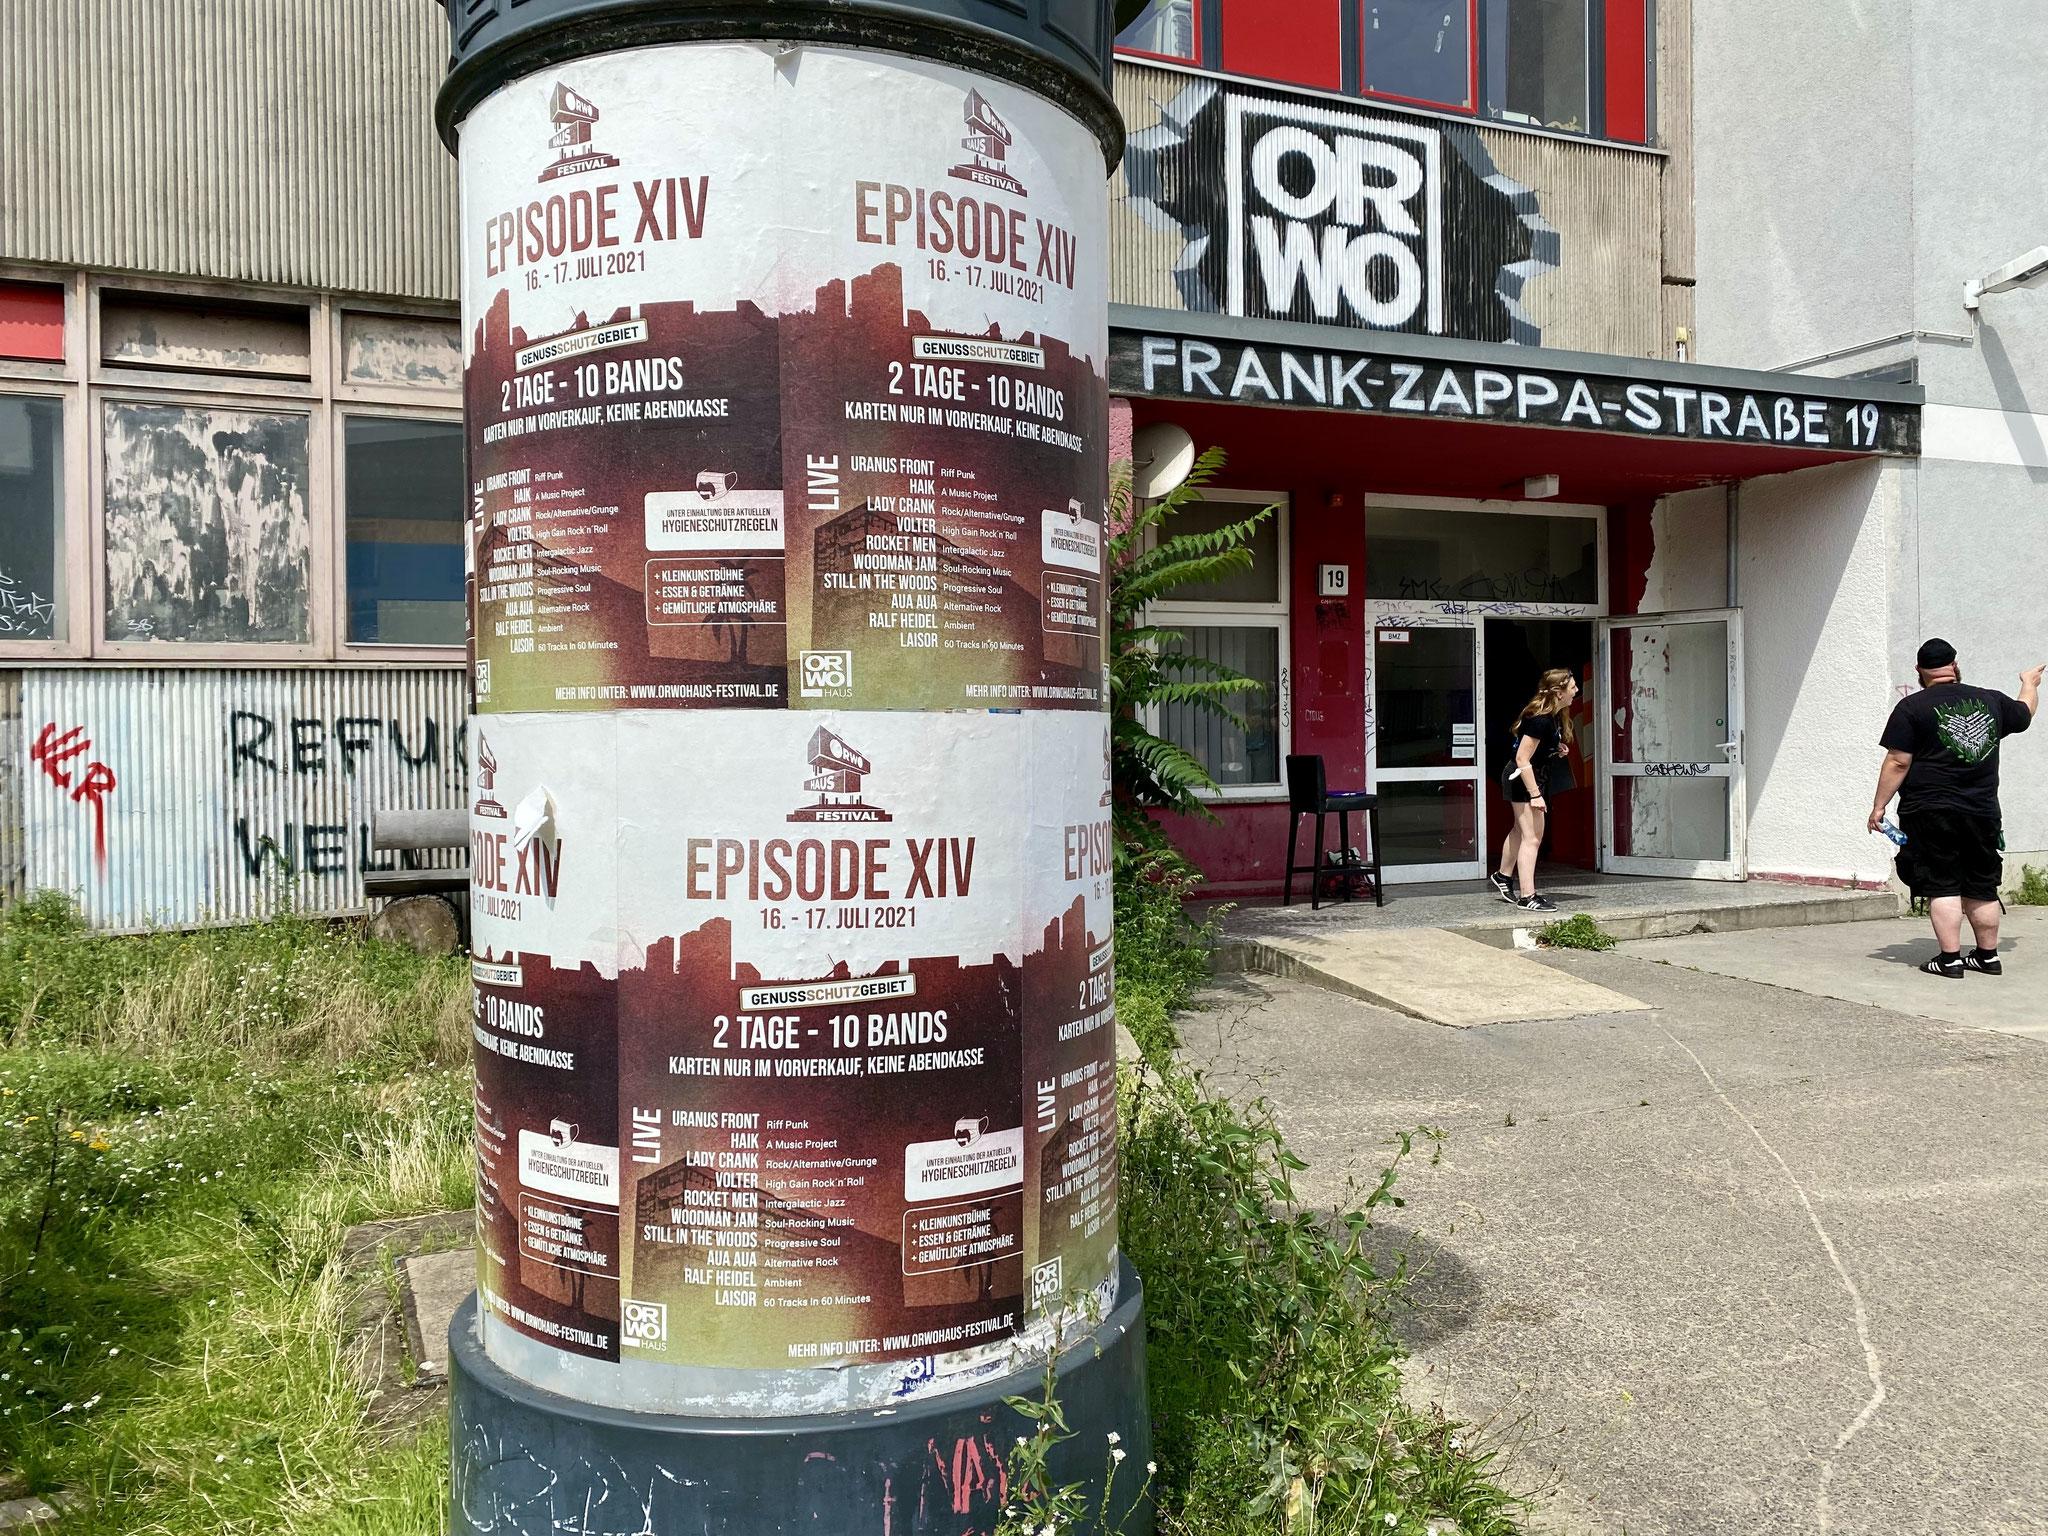 Sa, 17.07. | 15.00-00.00 Uhr: Tag 2 des ORWOhaus Festivals